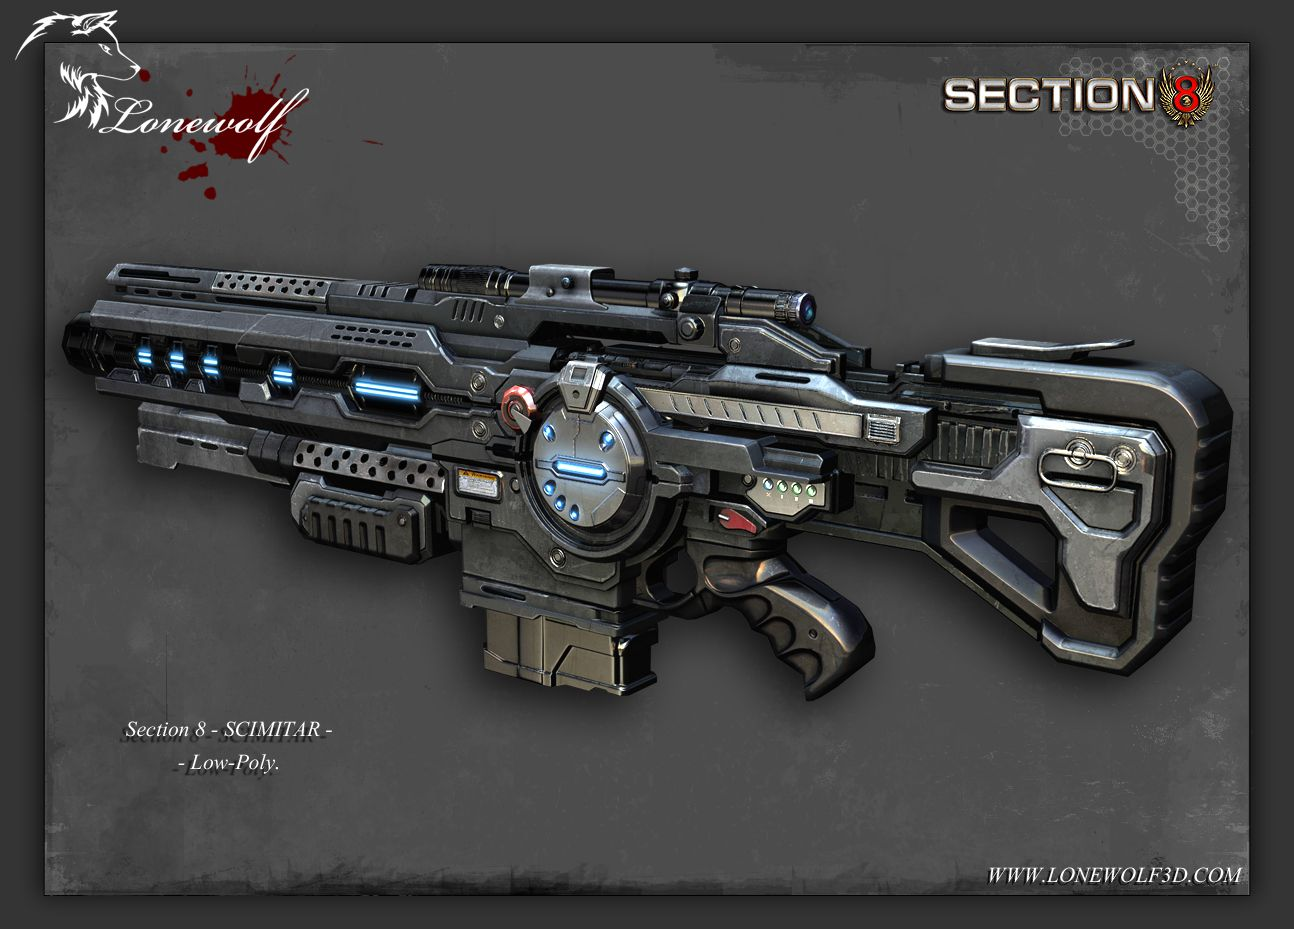 Section 8 Artwork 武器